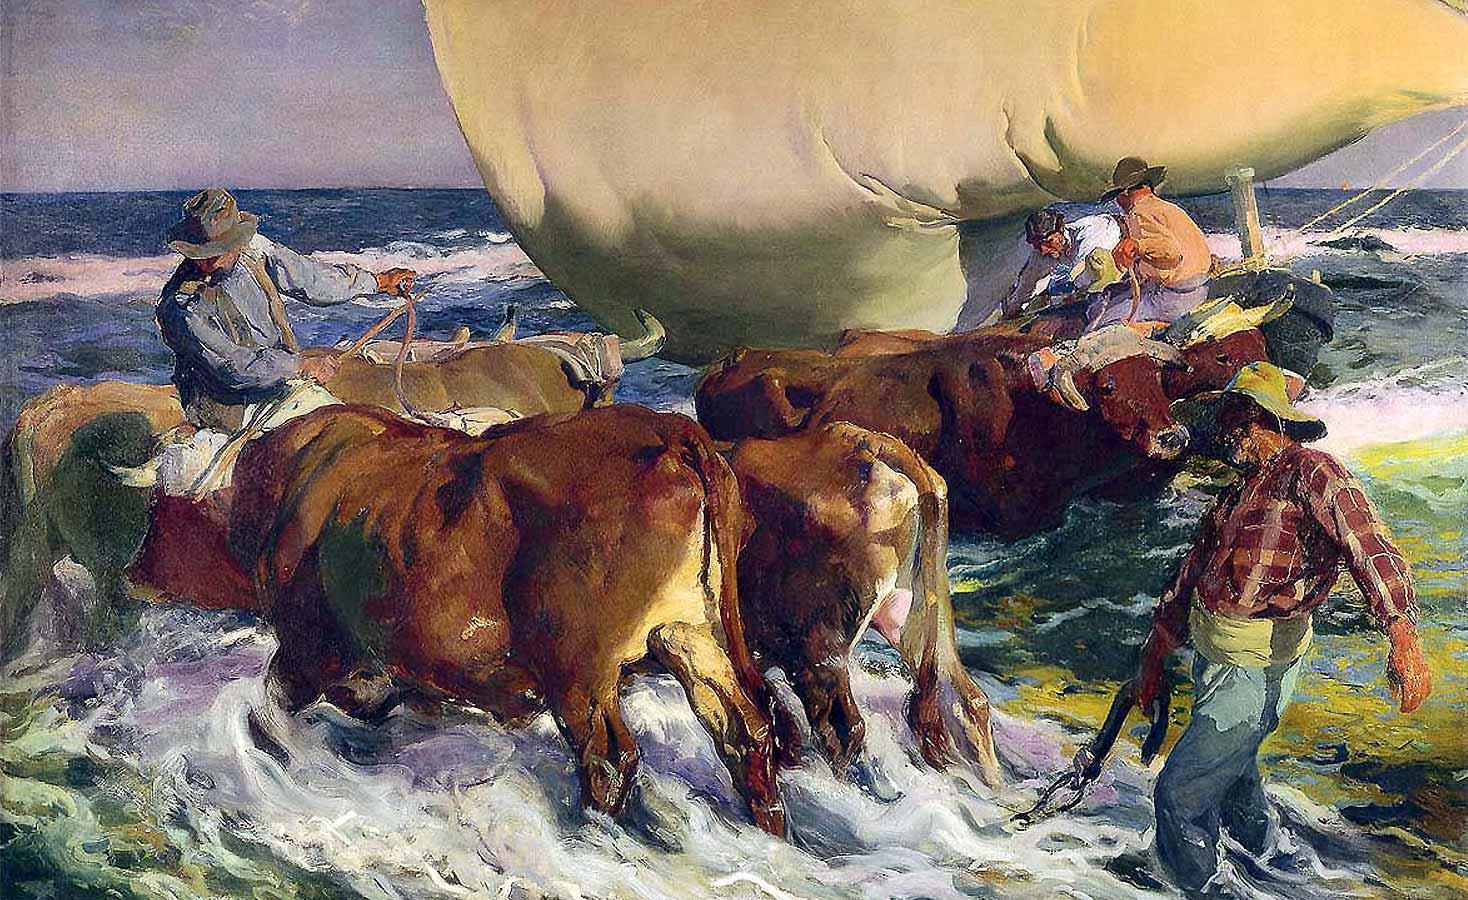 spanish impressionist painter Joaquin Sorolla